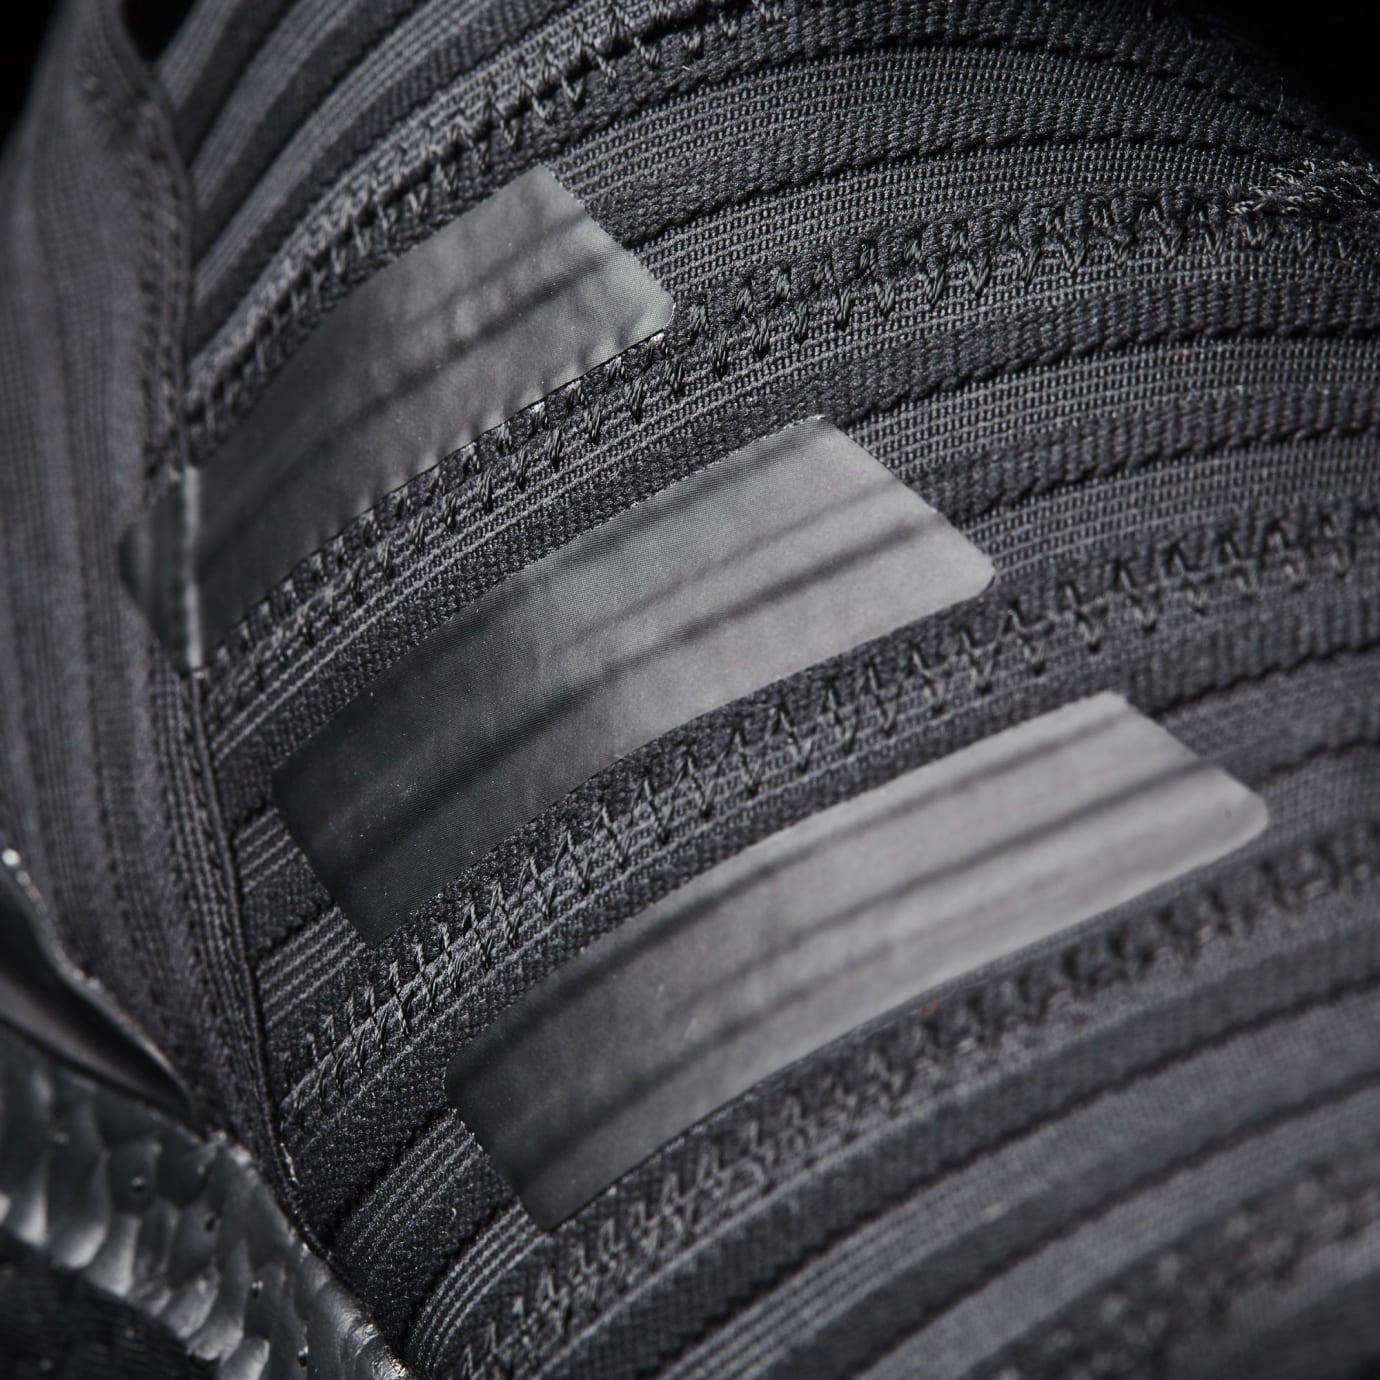 Adidas Nemeziz Tango 17+ 360 Agility 'Triple Black' CG3657 (Three Stripe)